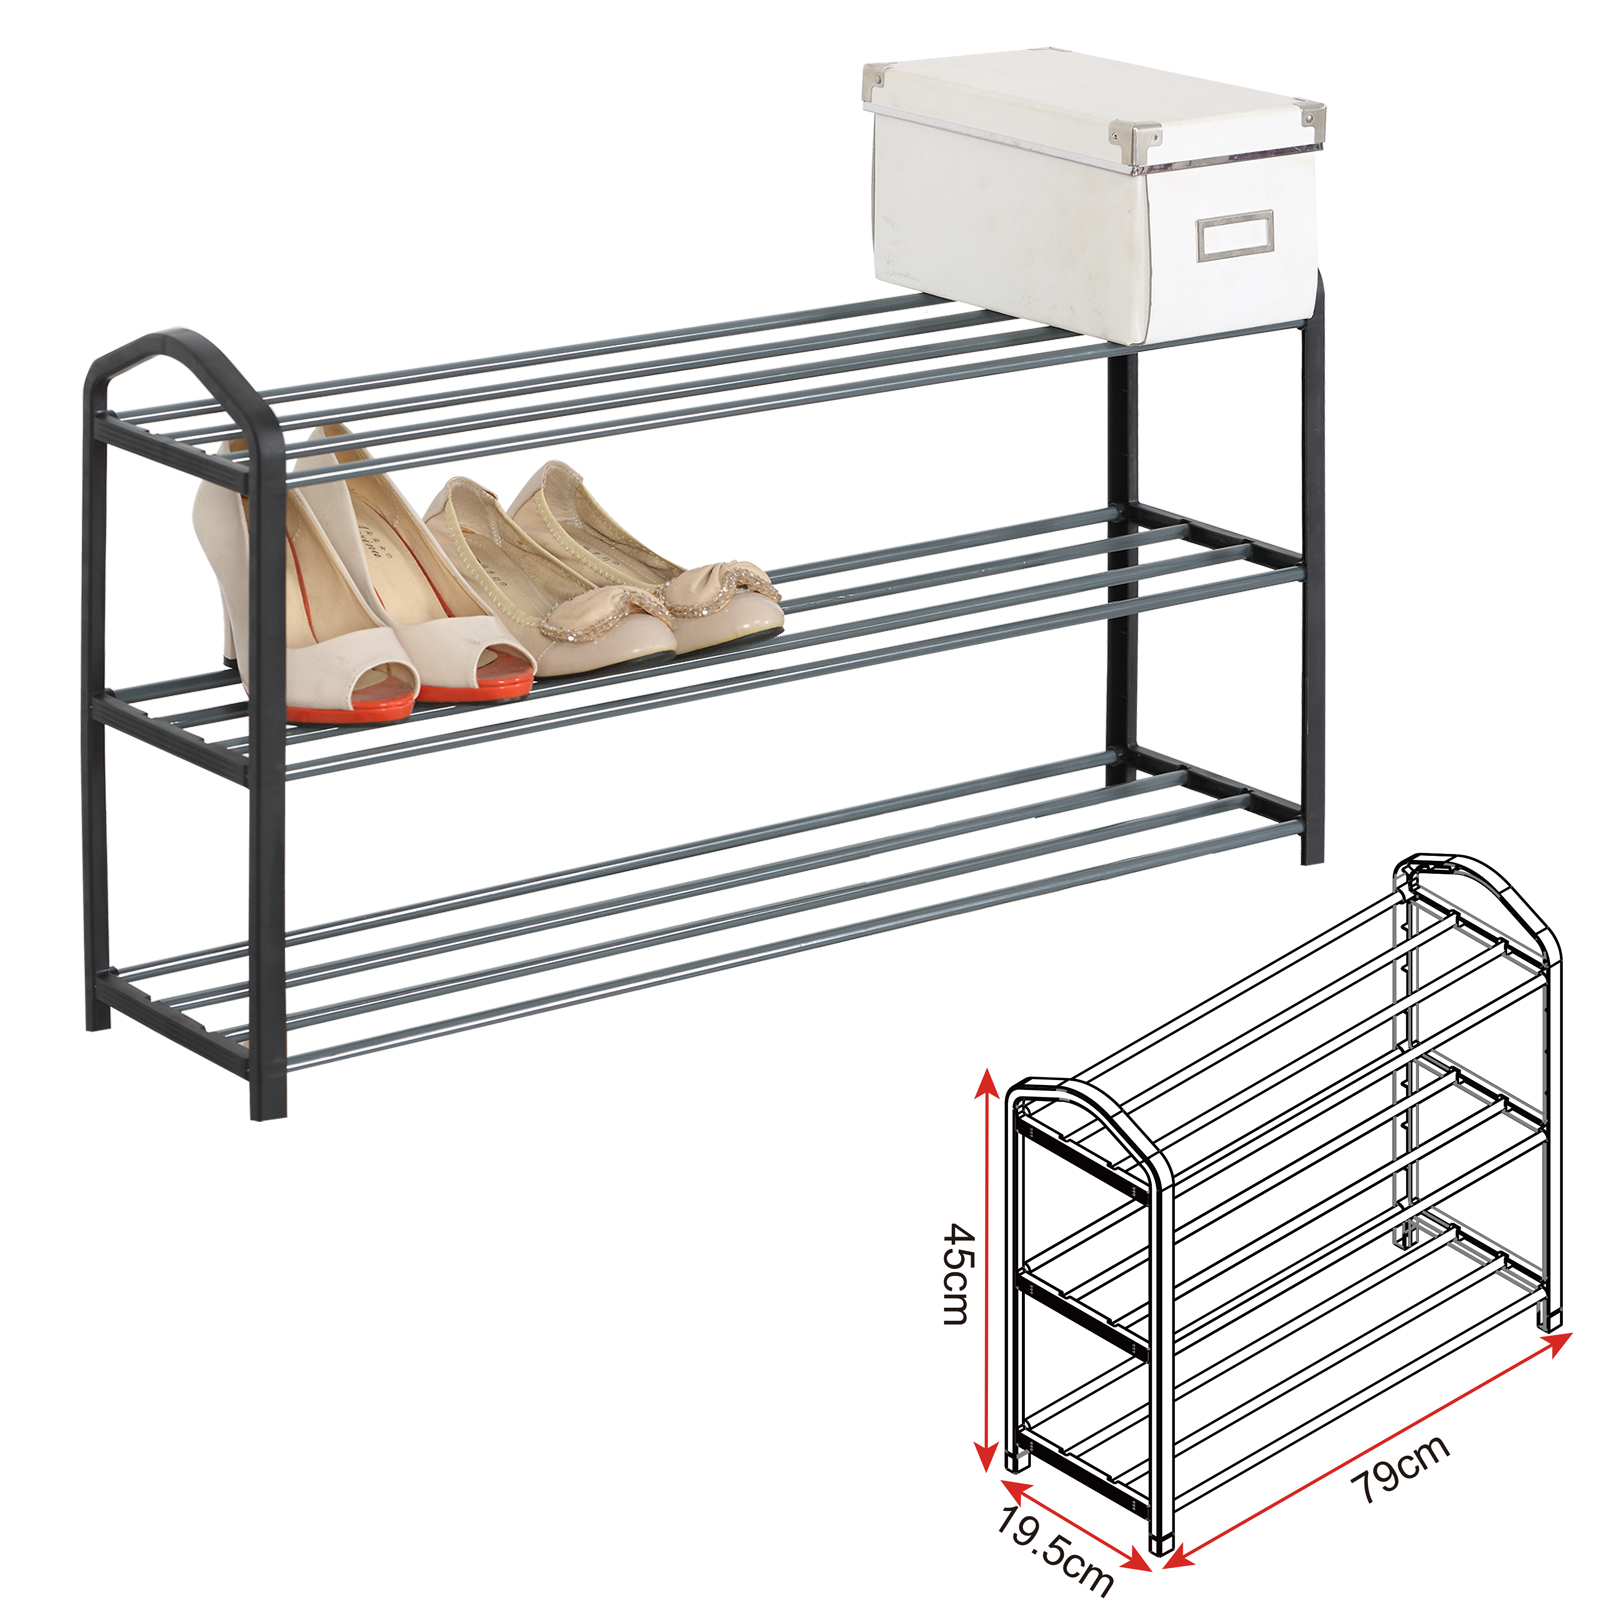 schuhablage schuh regal schrank 3 ebene f r 12 paare. Black Bedroom Furniture Sets. Home Design Ideas